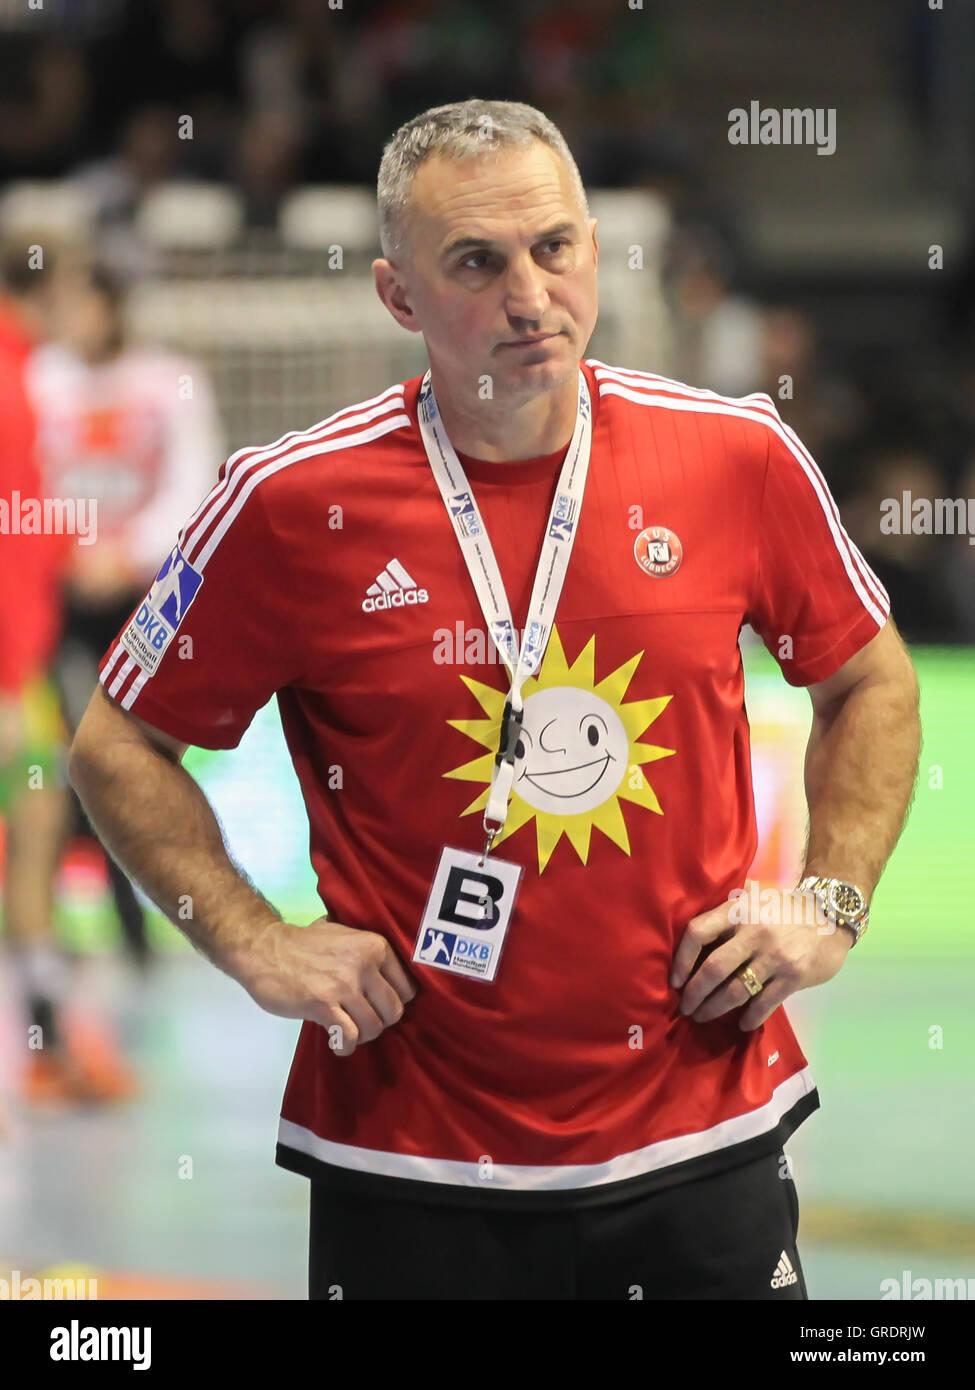 Coach Goran Perkovac Tus N-Lübbecke - Stock Image